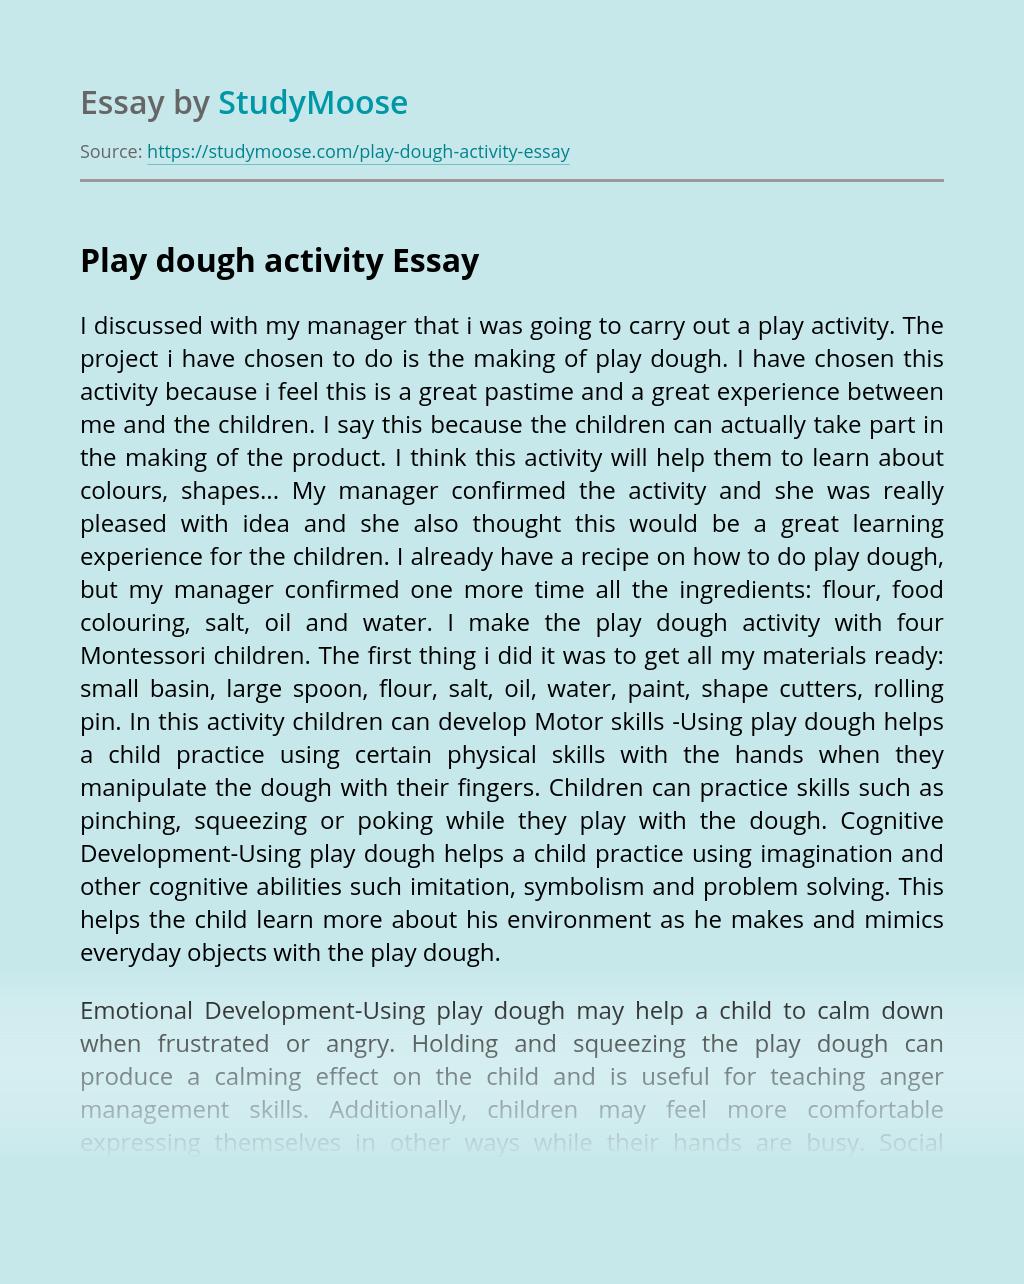 Play dough activity